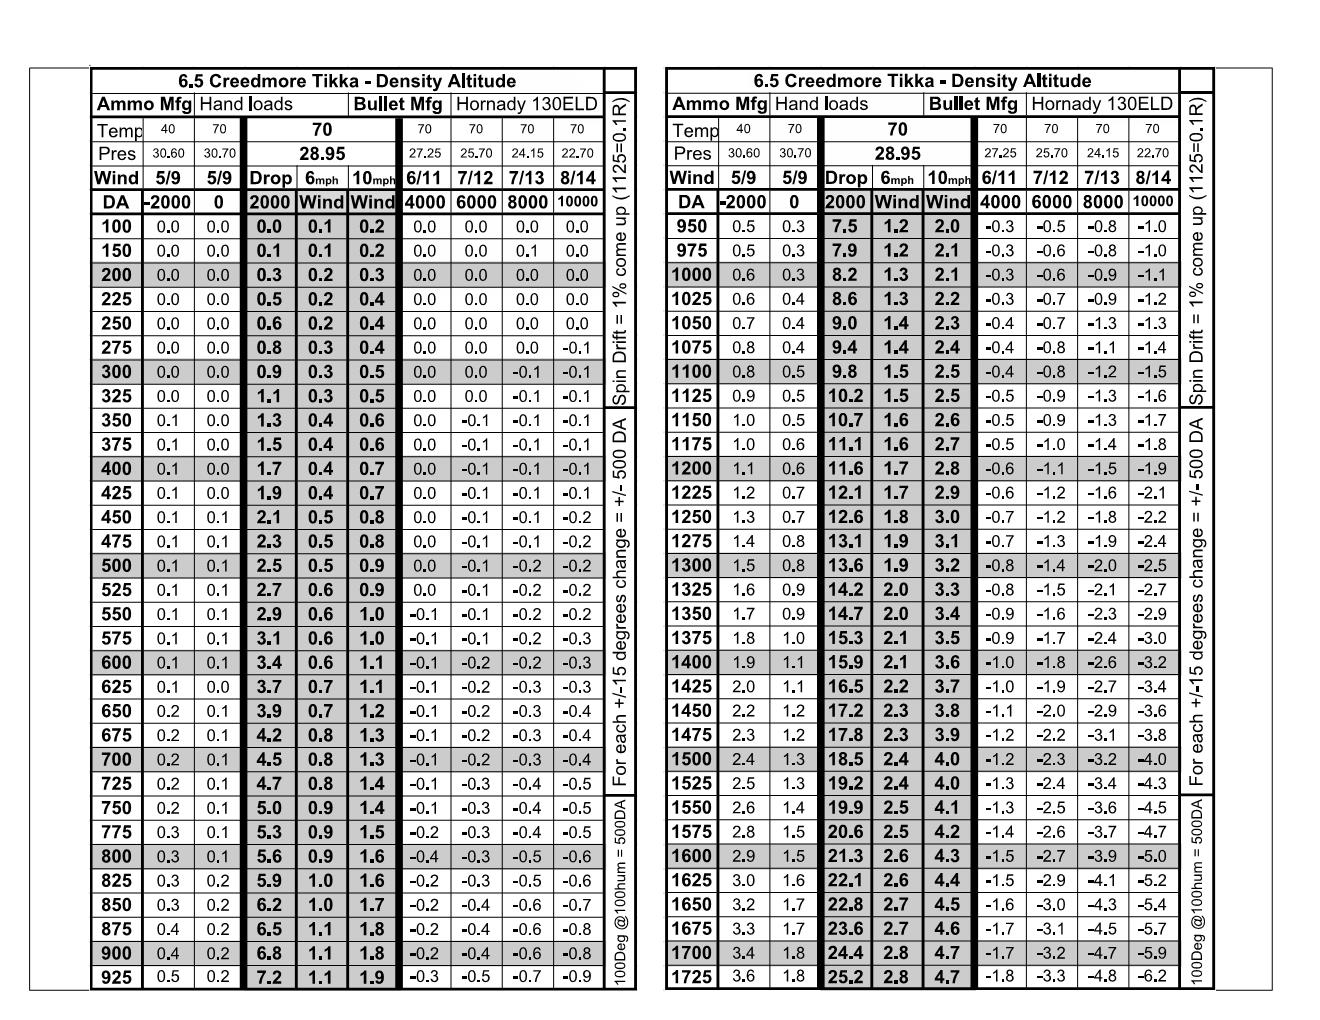 Tikka 6.5 Creed HL 130ELD 2019-10-17 Density Altitude 2.jpg